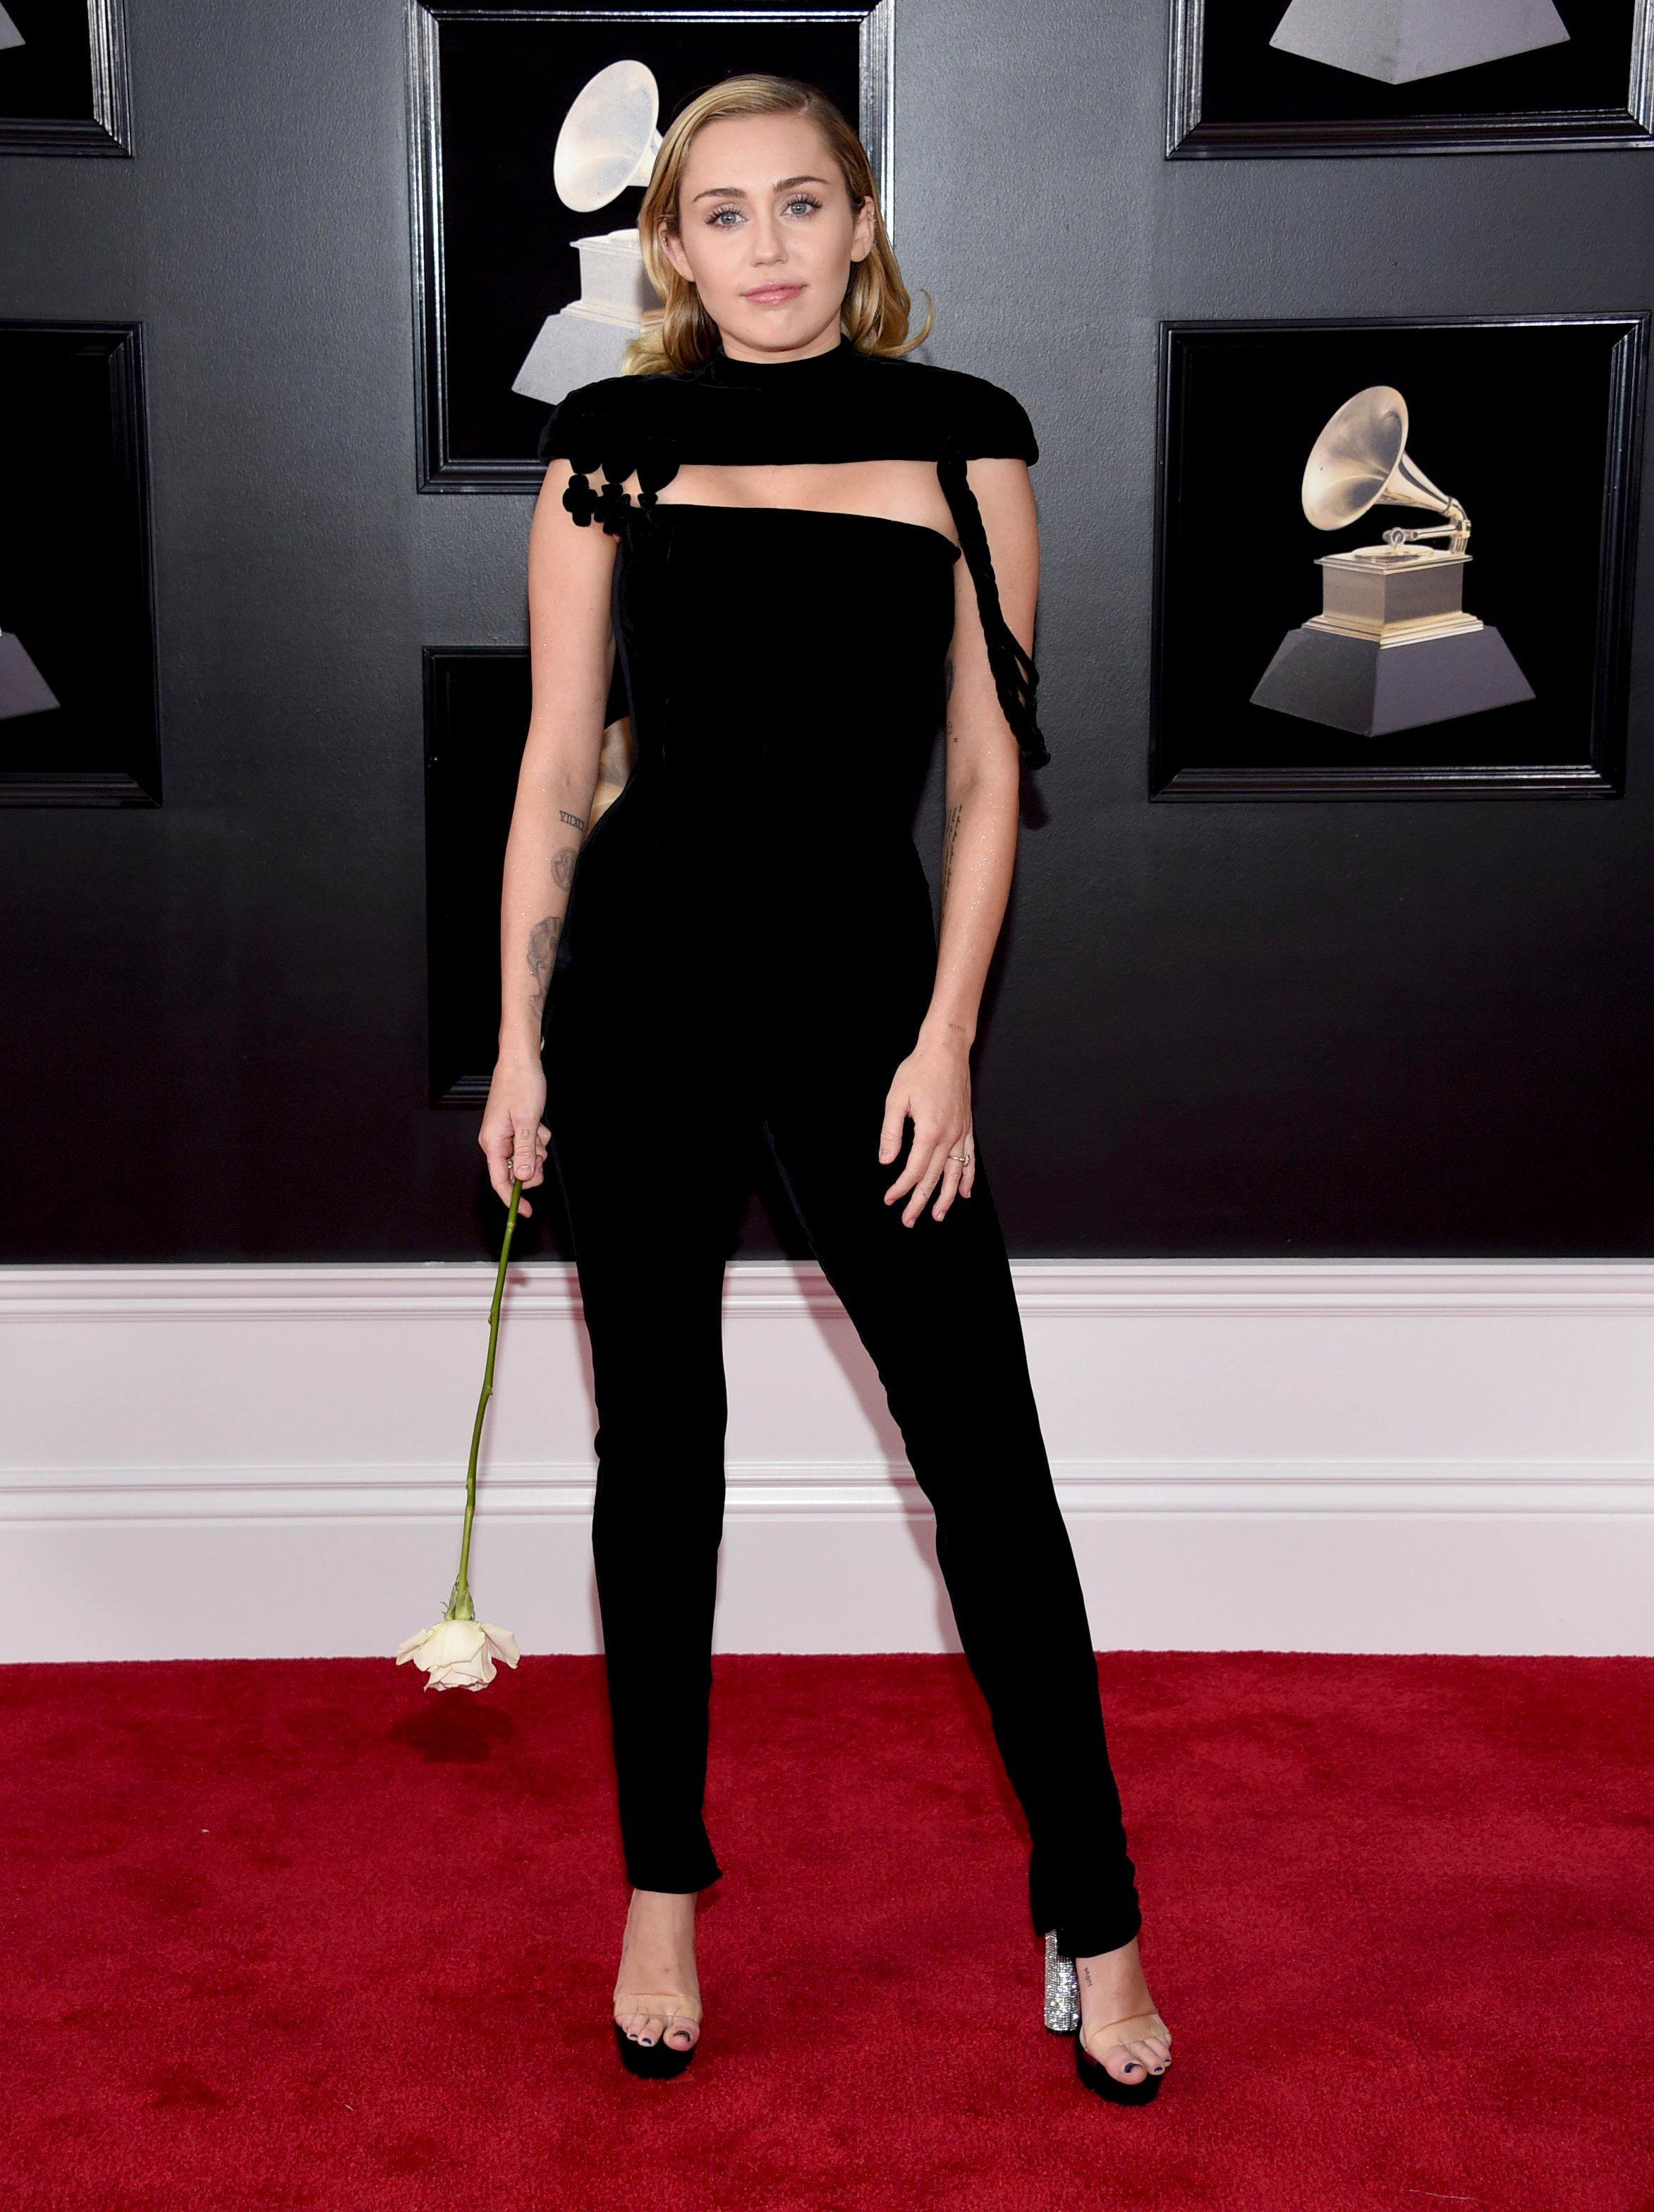 Grammy Awards 2018: 12 Best Dressed Stars - Fame10